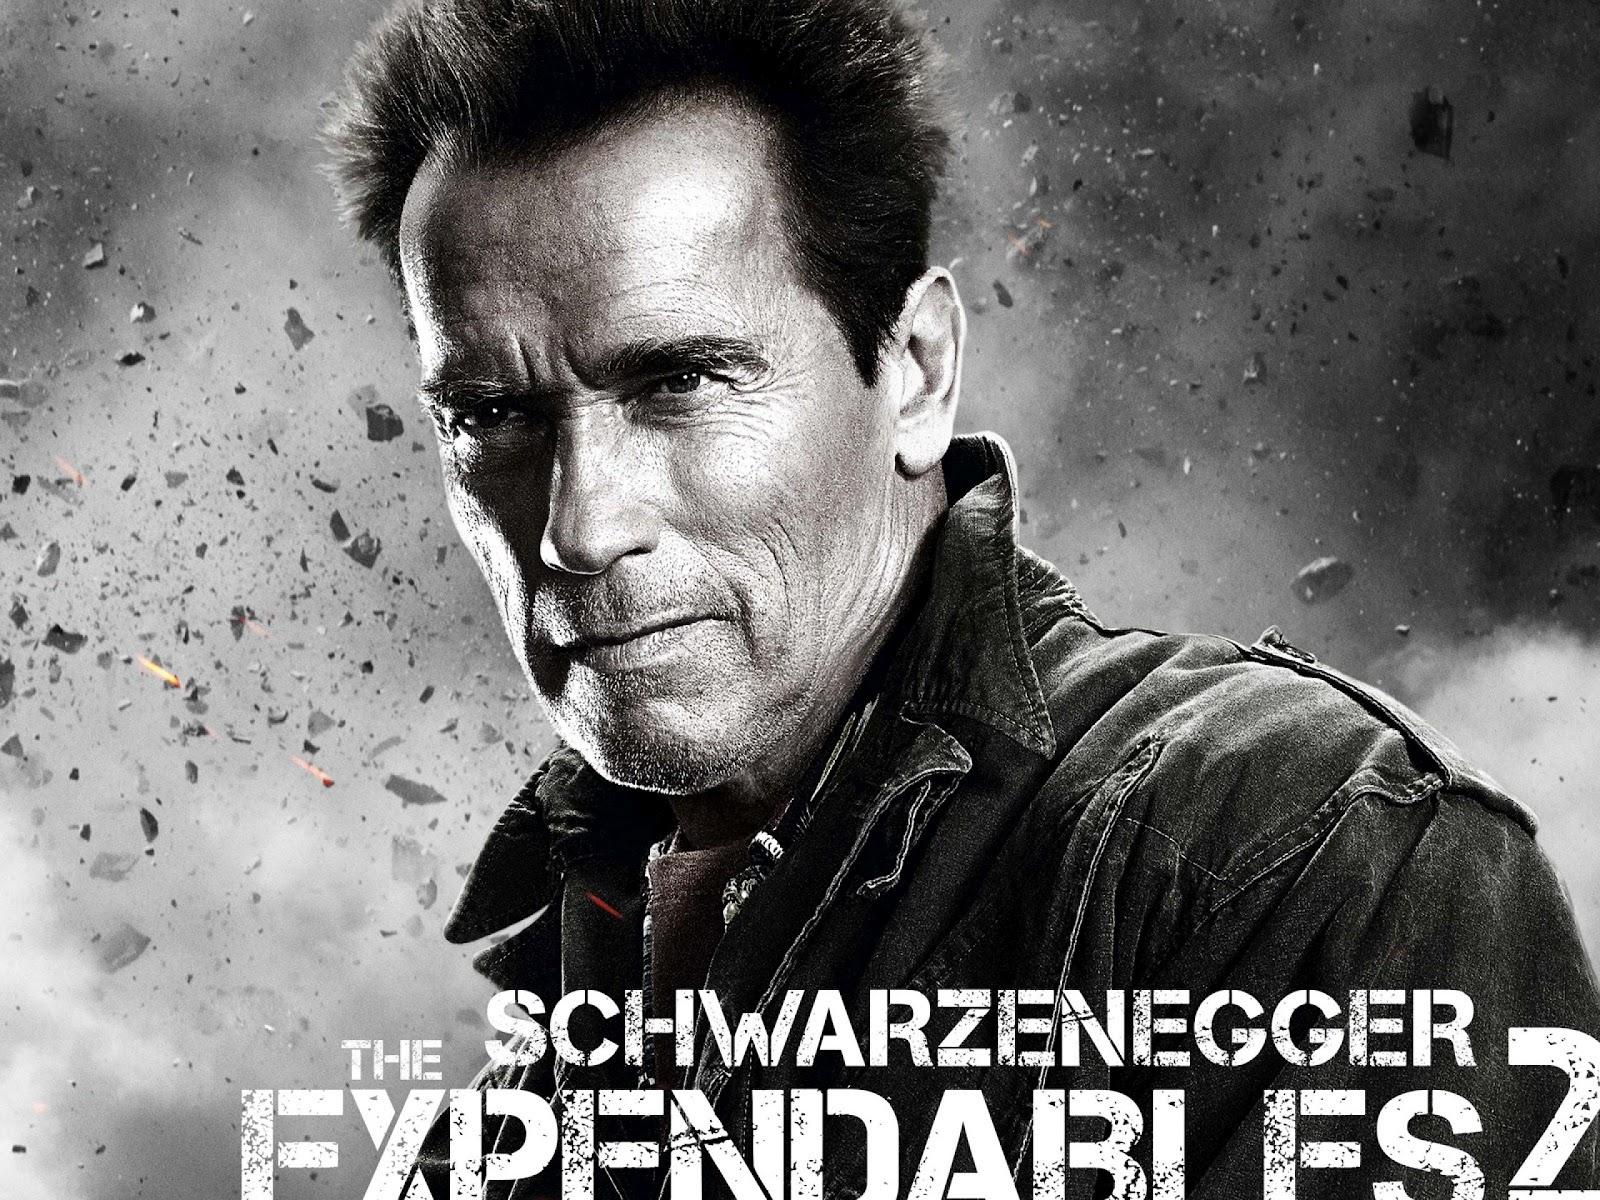 http://1.bp.blogspot.com/-kNFhro0EG5I/T_WuYseODUI/AAAAAAAAB-I/kU7DvqPU4to/s1600/The-Expendables-2-Movie-Arnold-Schwarzenegger-1920x2560.jpg